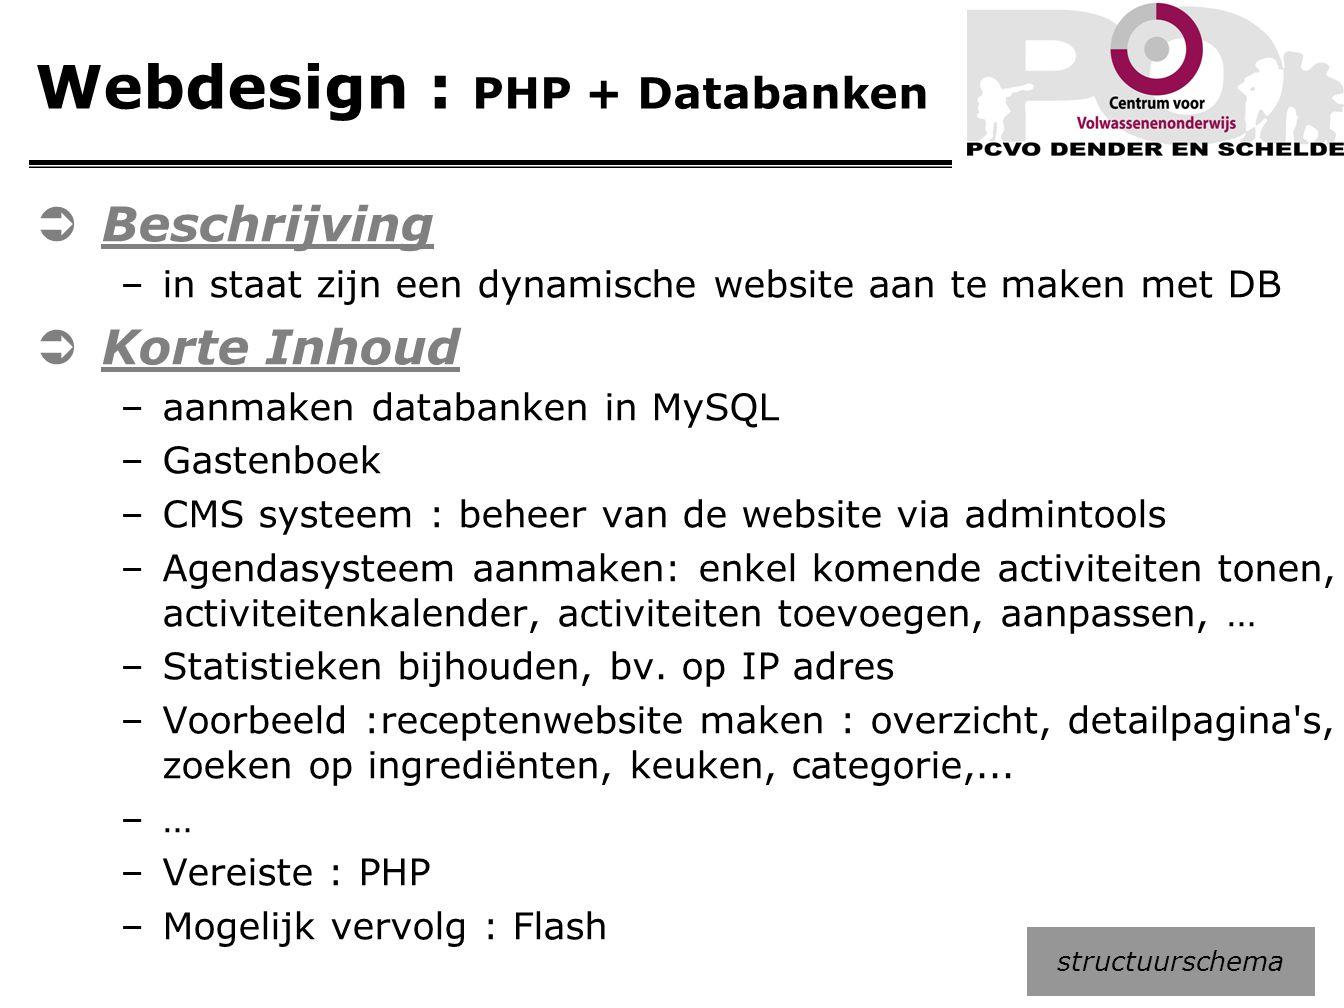 Webdesign : PHP + Databanken